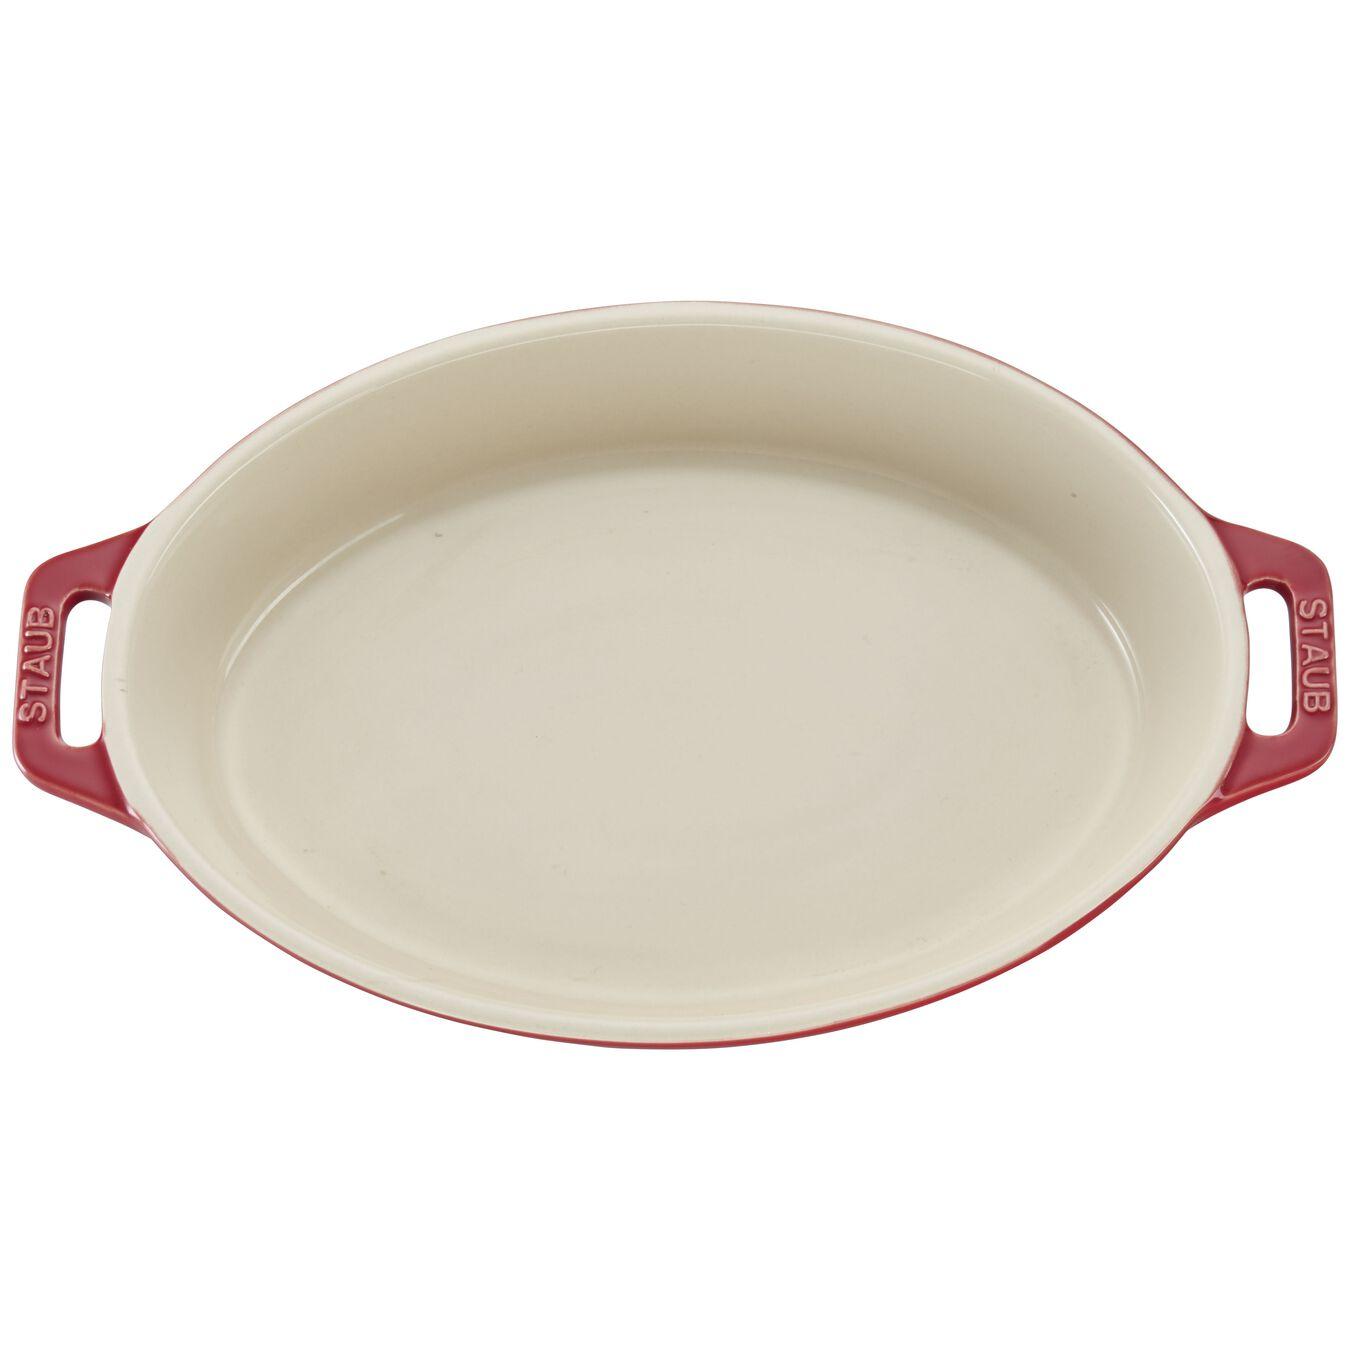 4-pc Baking Dish Set - Cherry,,large 4